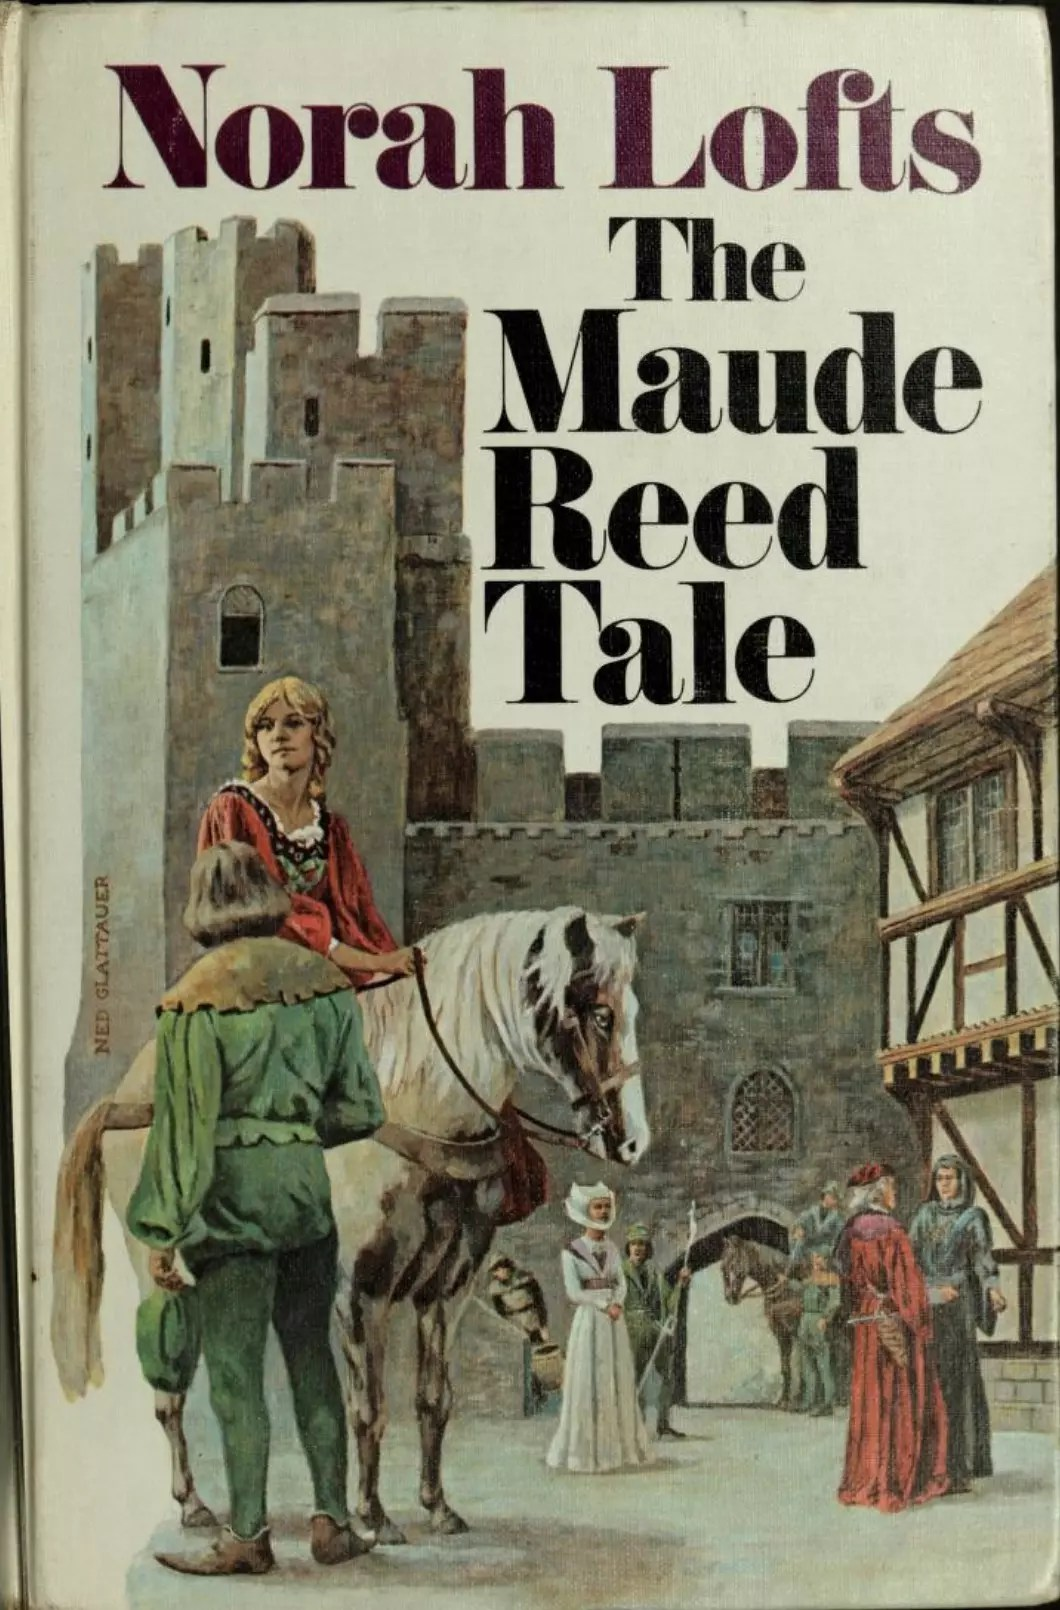 Norah Lofts The Maude Reed Tale GJT